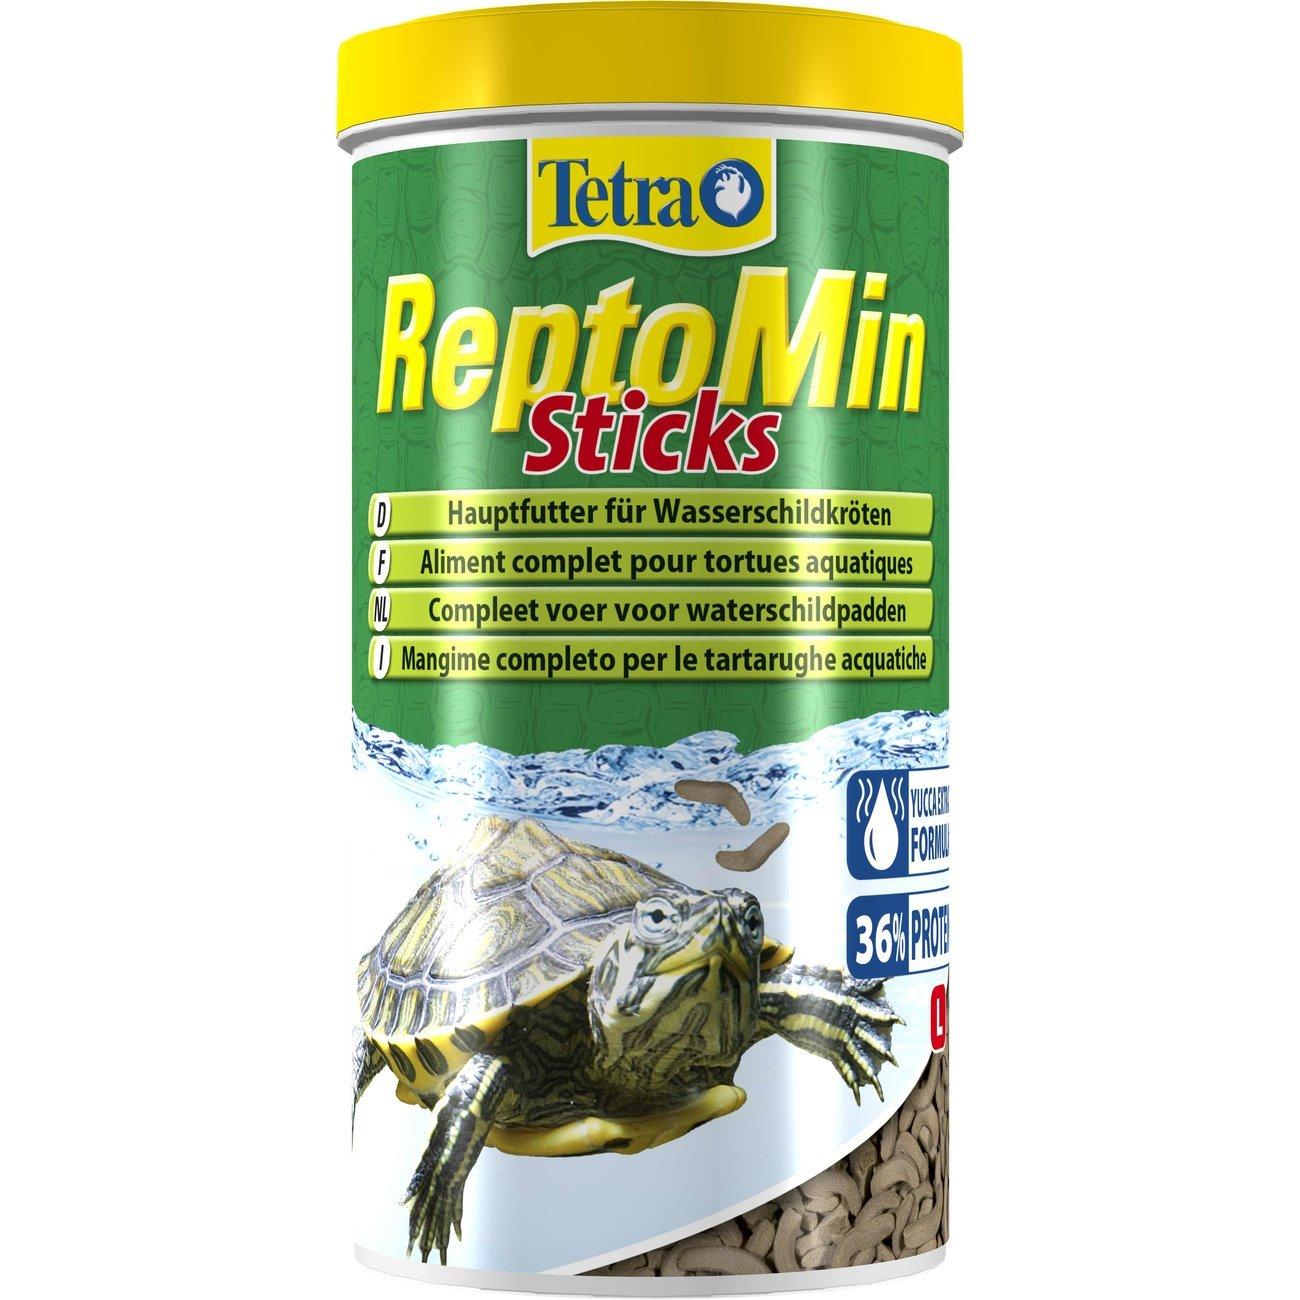 ReptoMin